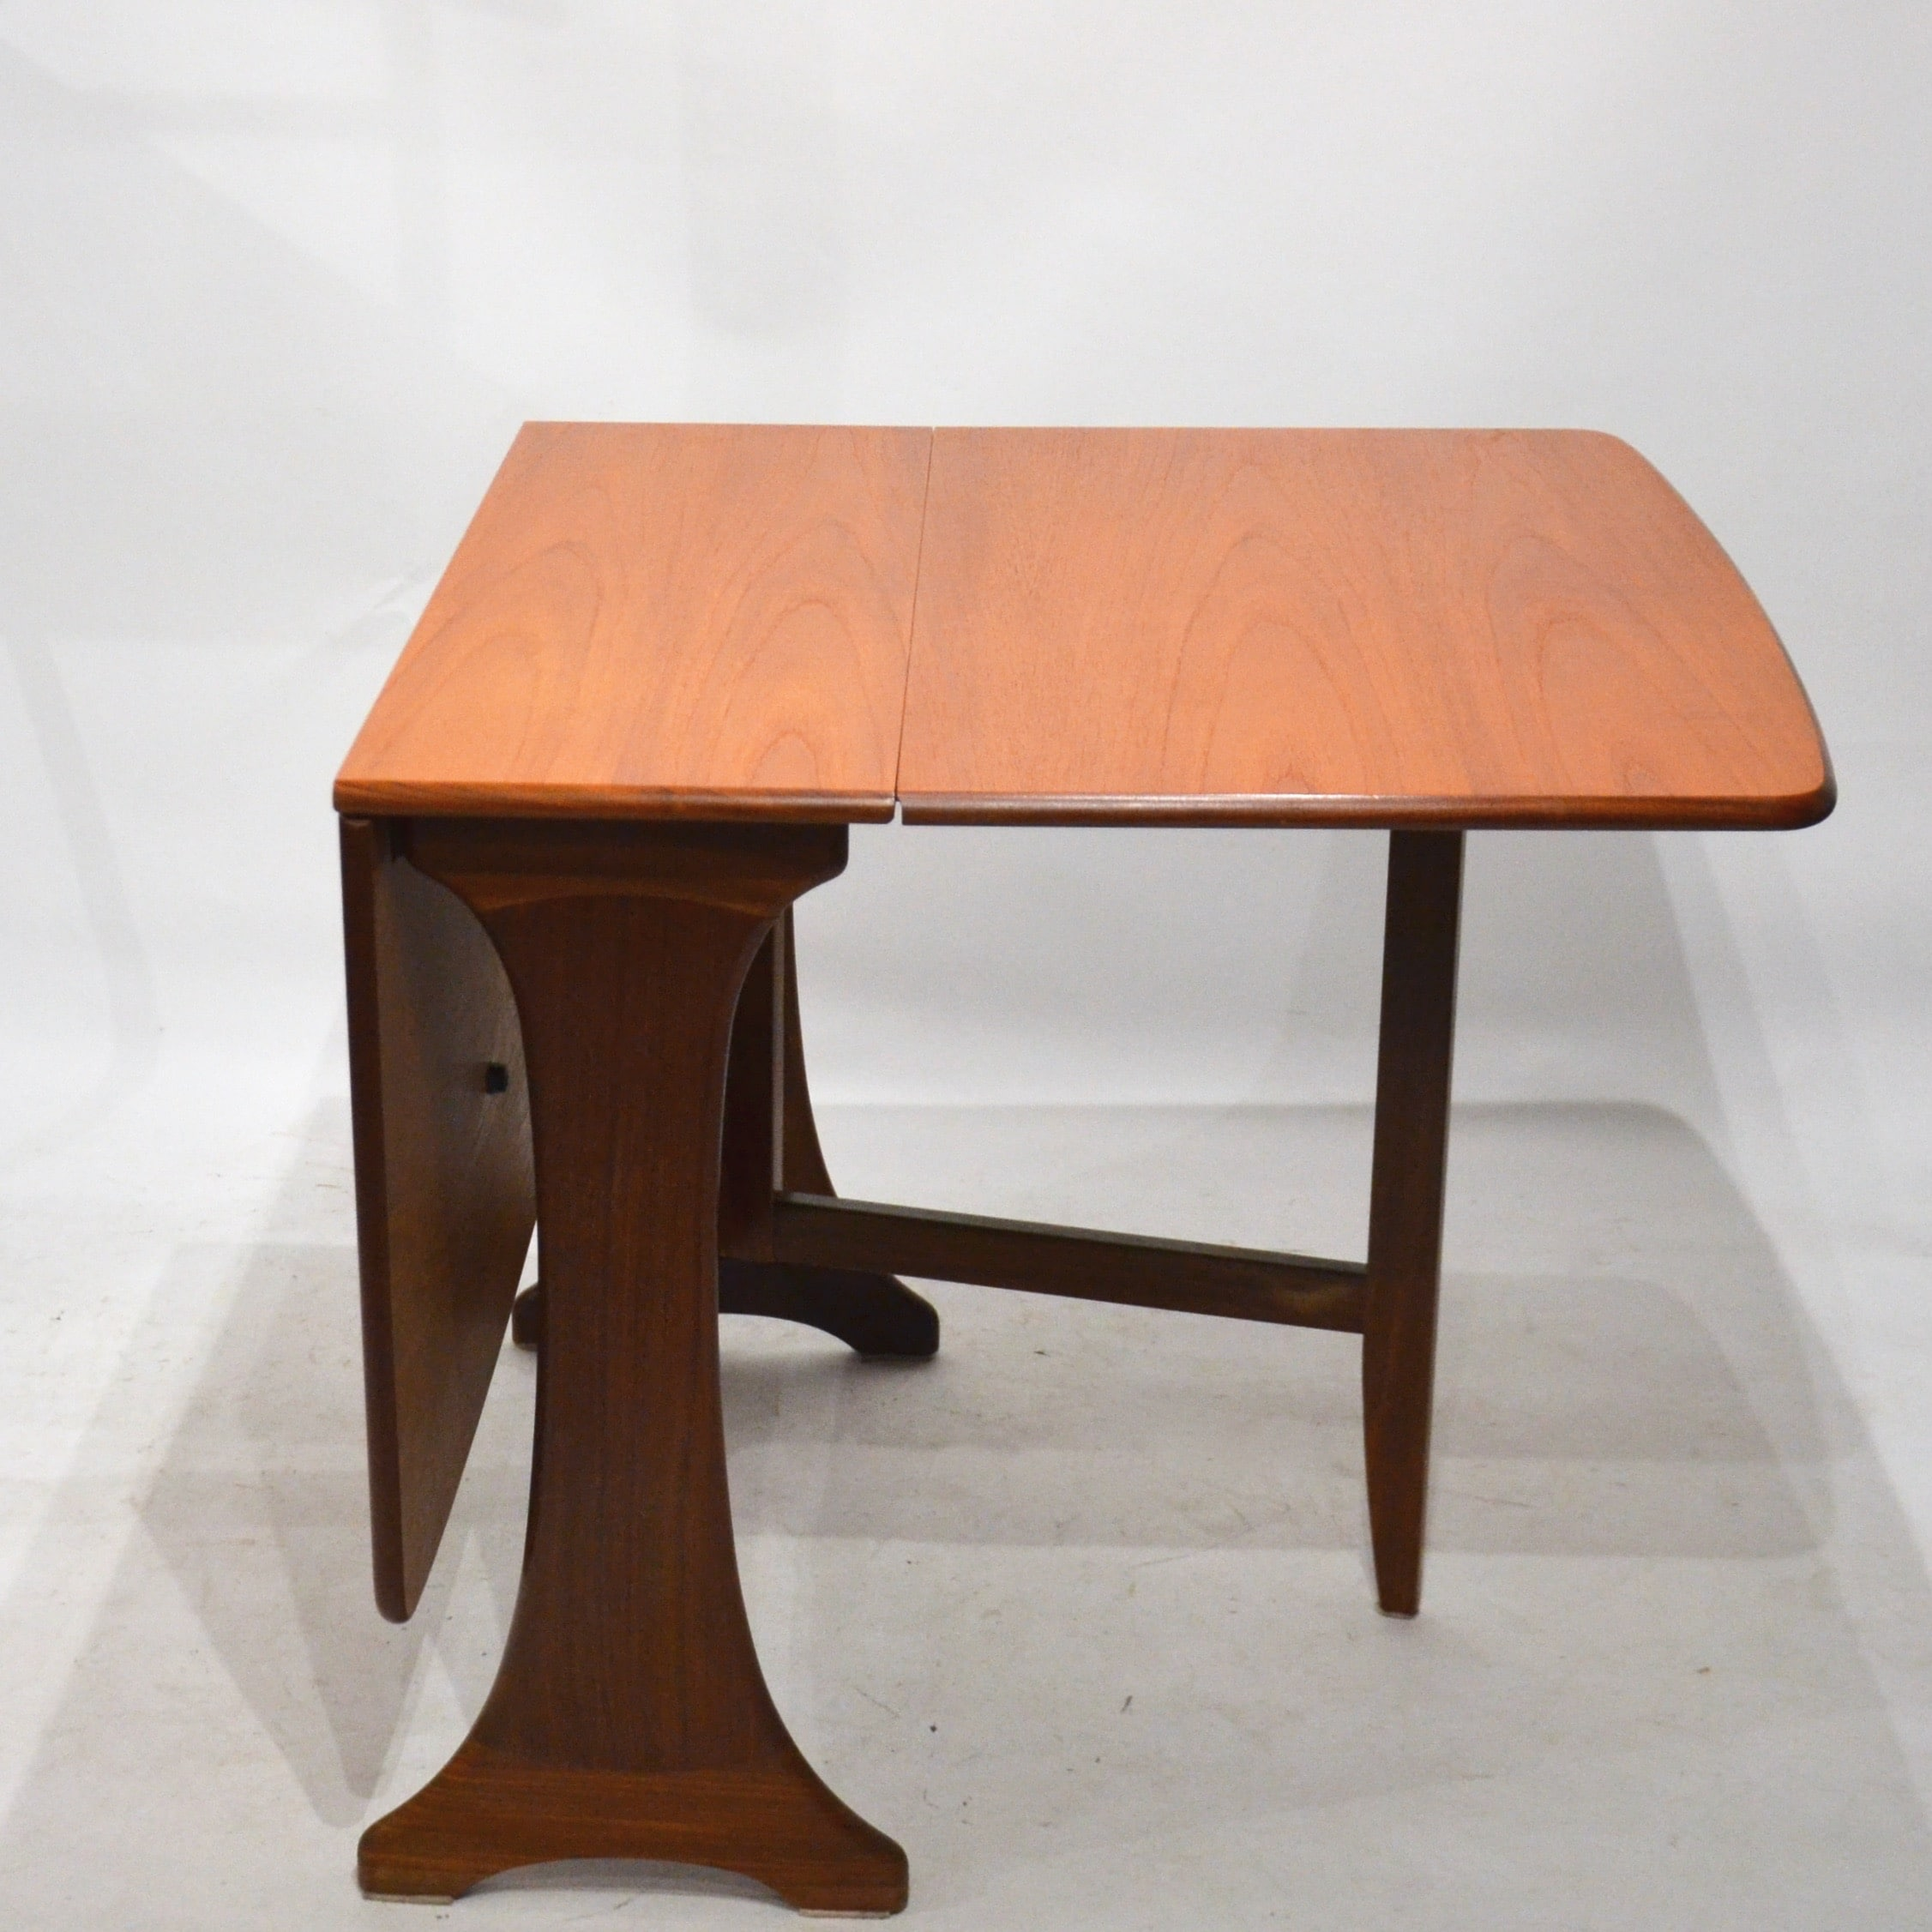 Table manger modulable scandinave bindiesbindies - Table a manger modulable ...